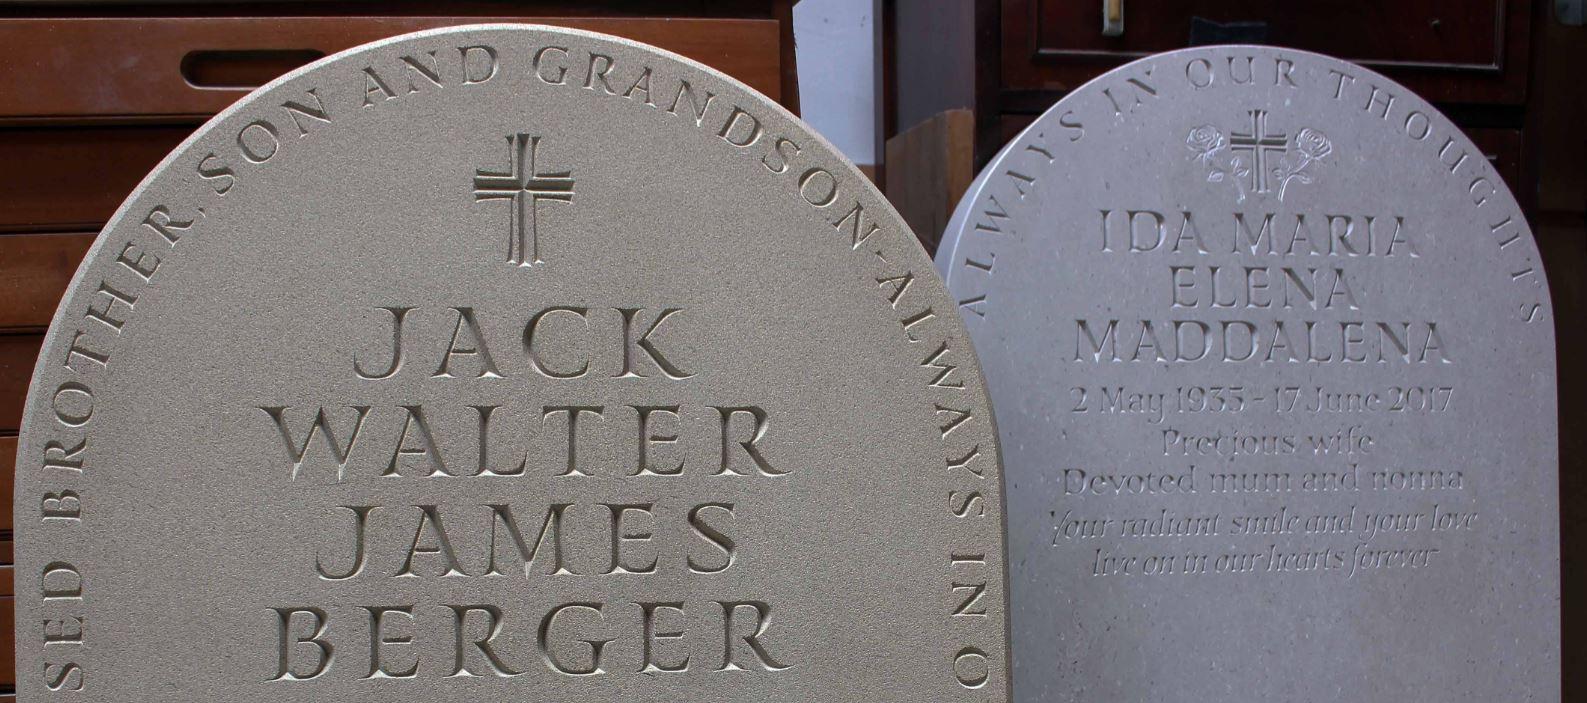 Hemel hempstead headstones, St.Albans Headstones, Watford Headstones